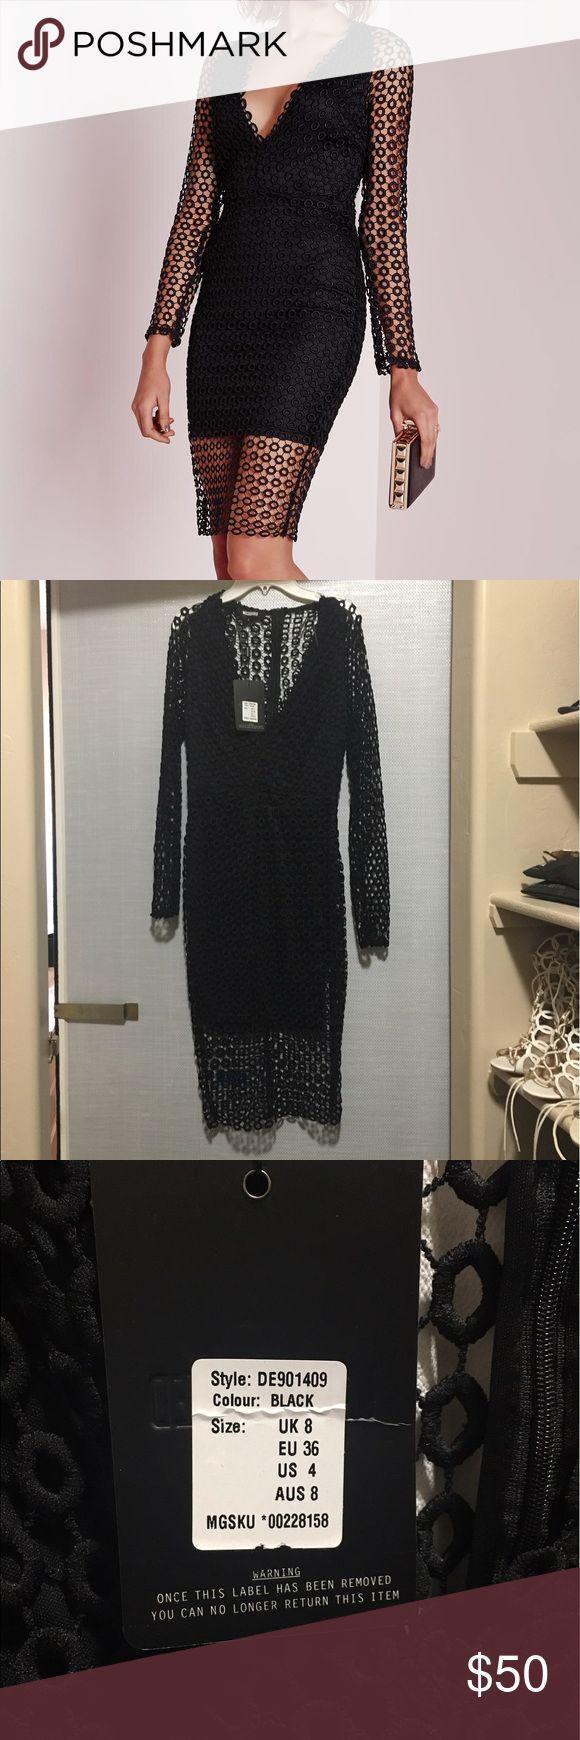 Brand new with tags black lace midi dress Semi low cut long sleeved lace midi dress Missguided Dresses Midi